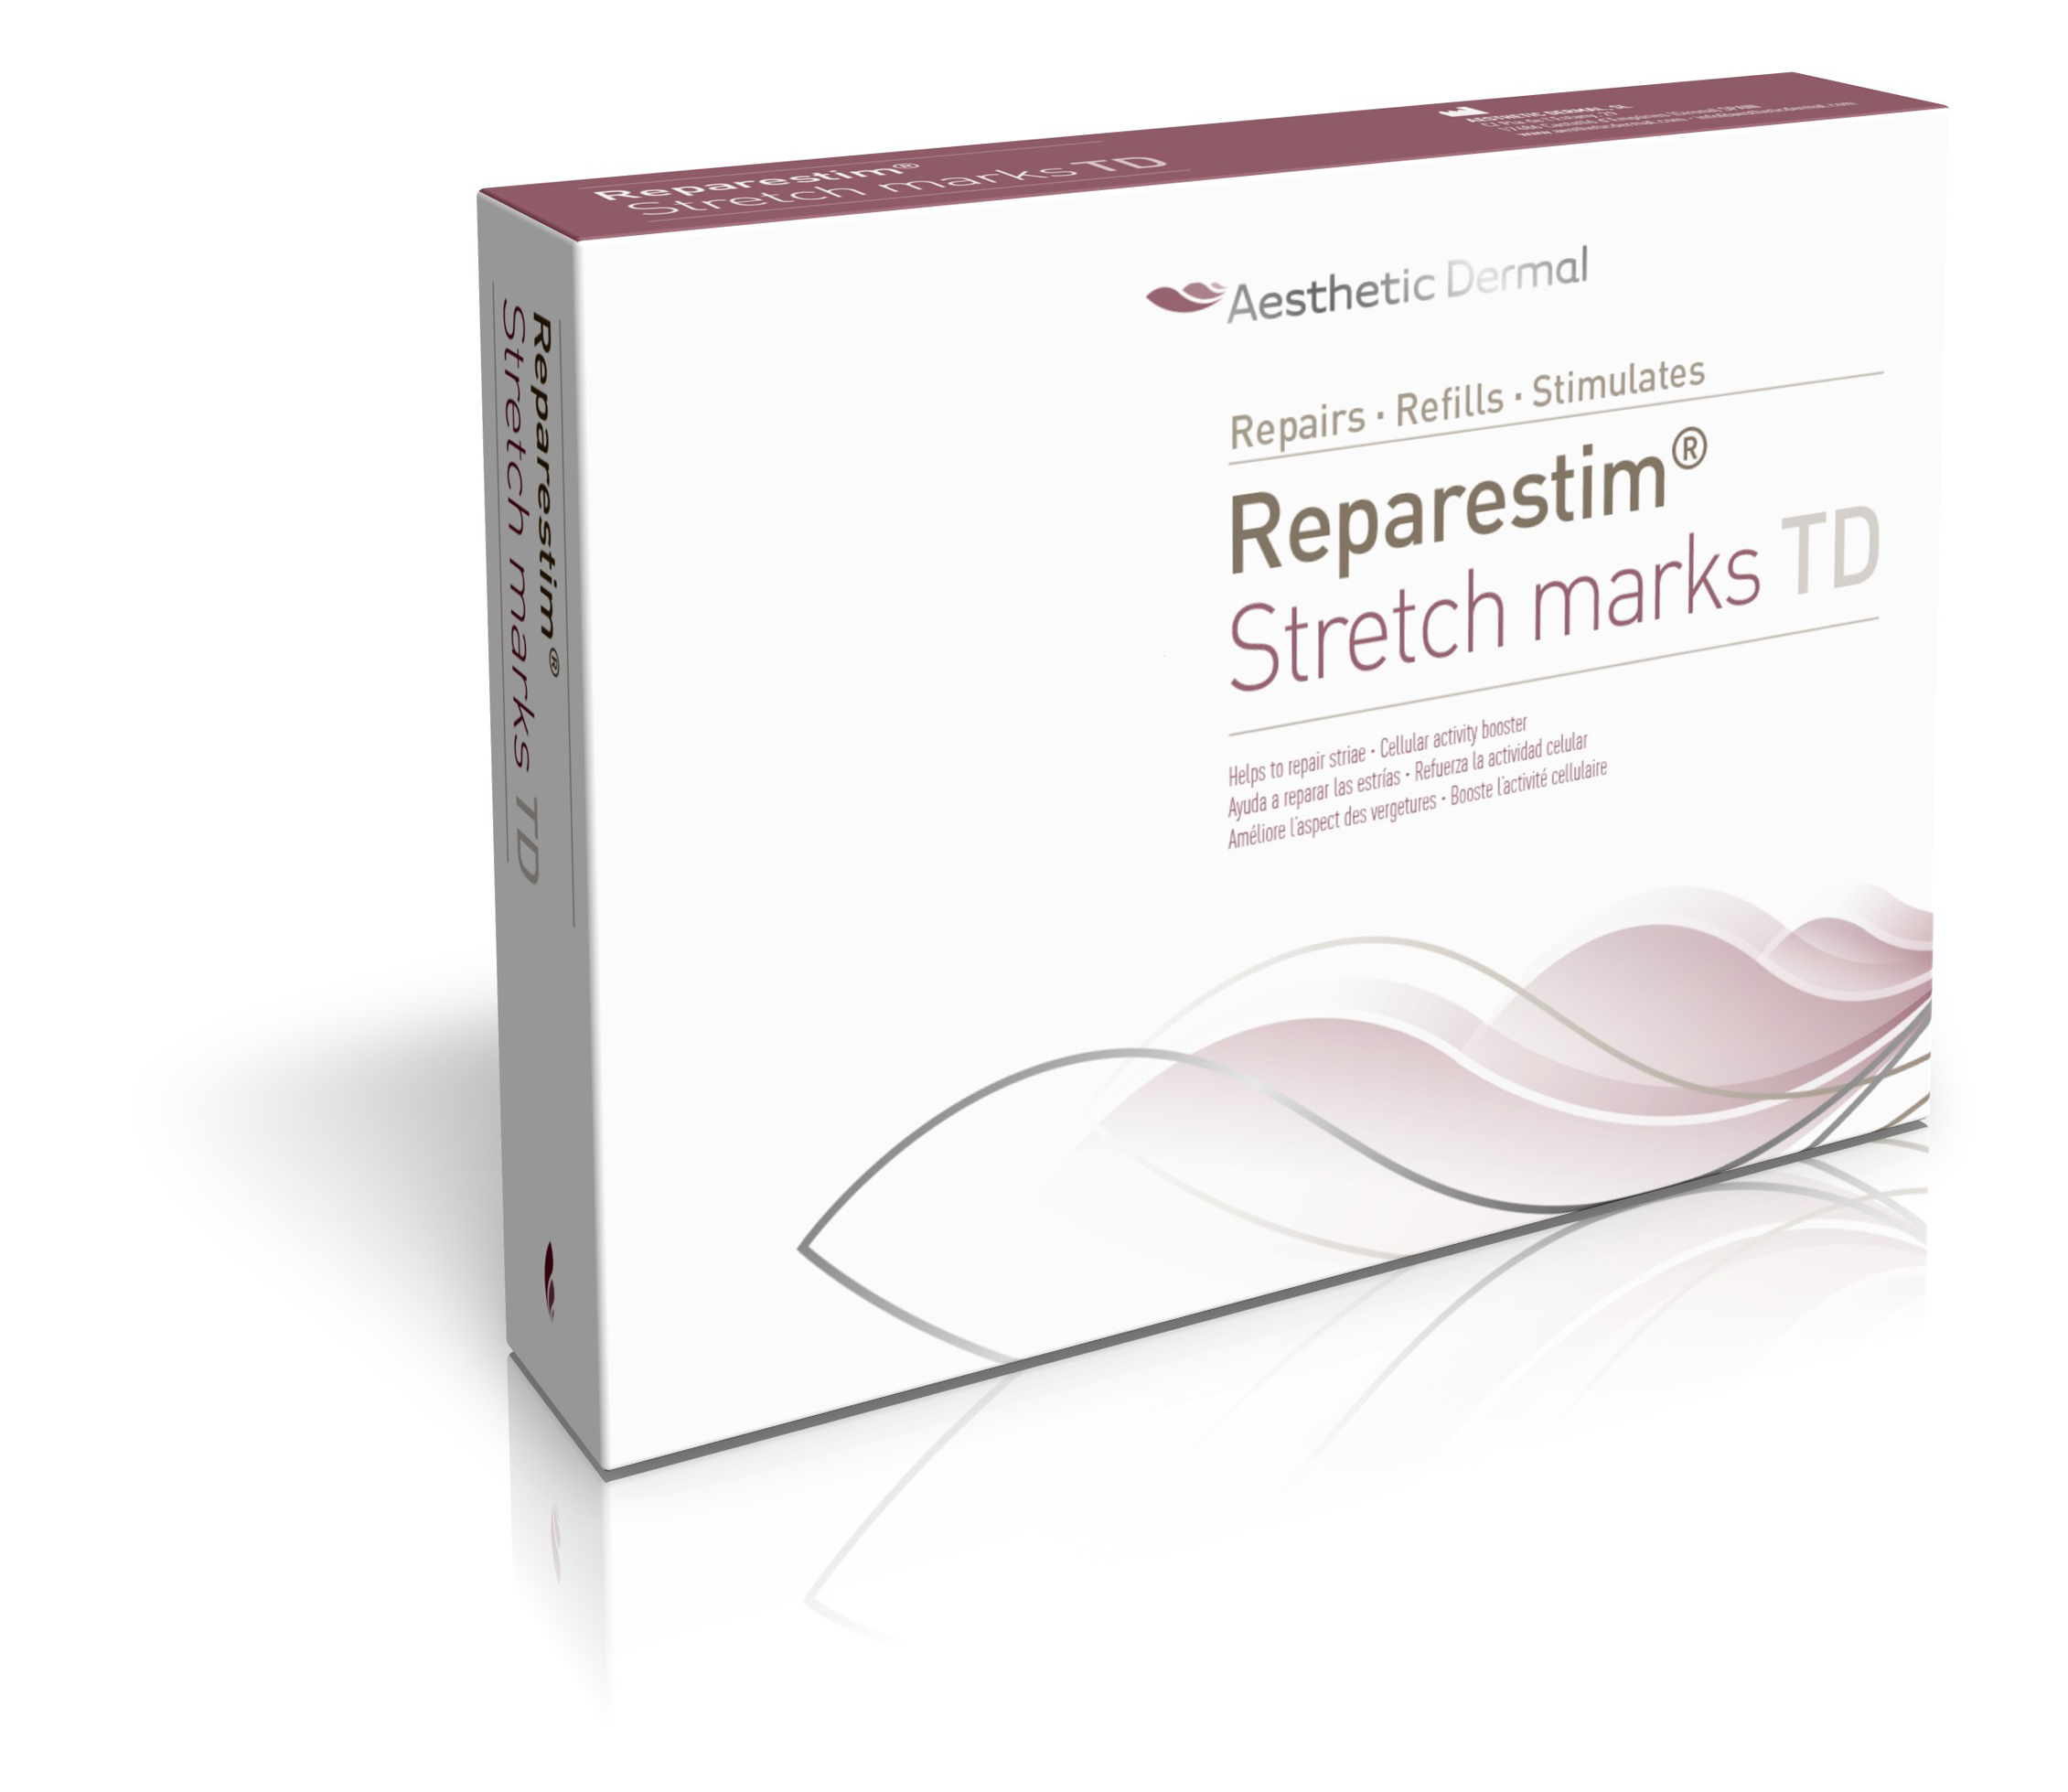 Aesthetic Dermal - ReparestimTD StretchMarks